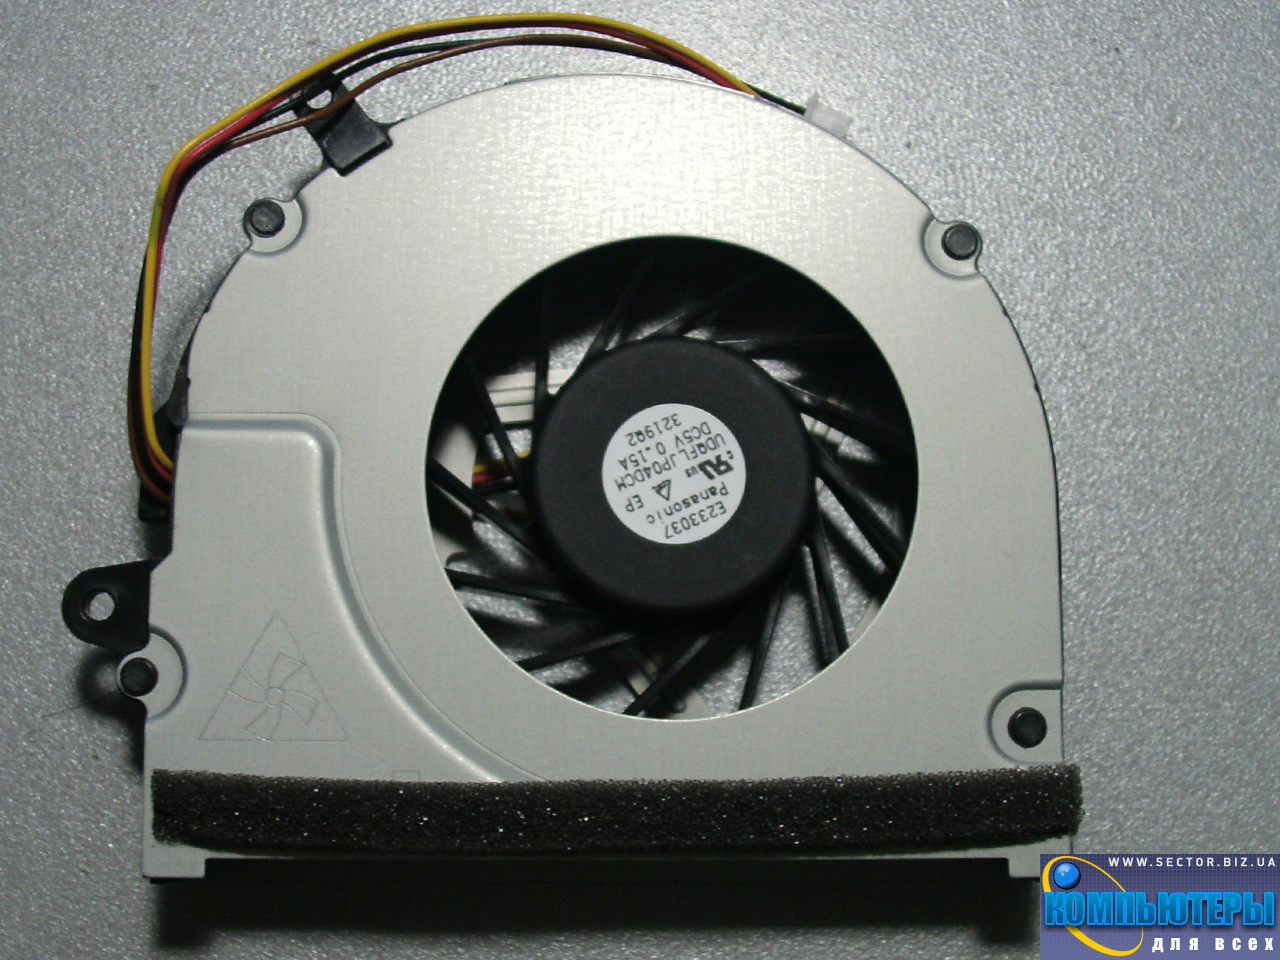 Кулер к ноутбуку Lenovo G480 G485 G580 G585 vers.1 p/n: UDQFLJP04DCM 3219Q2. Фото № 3.